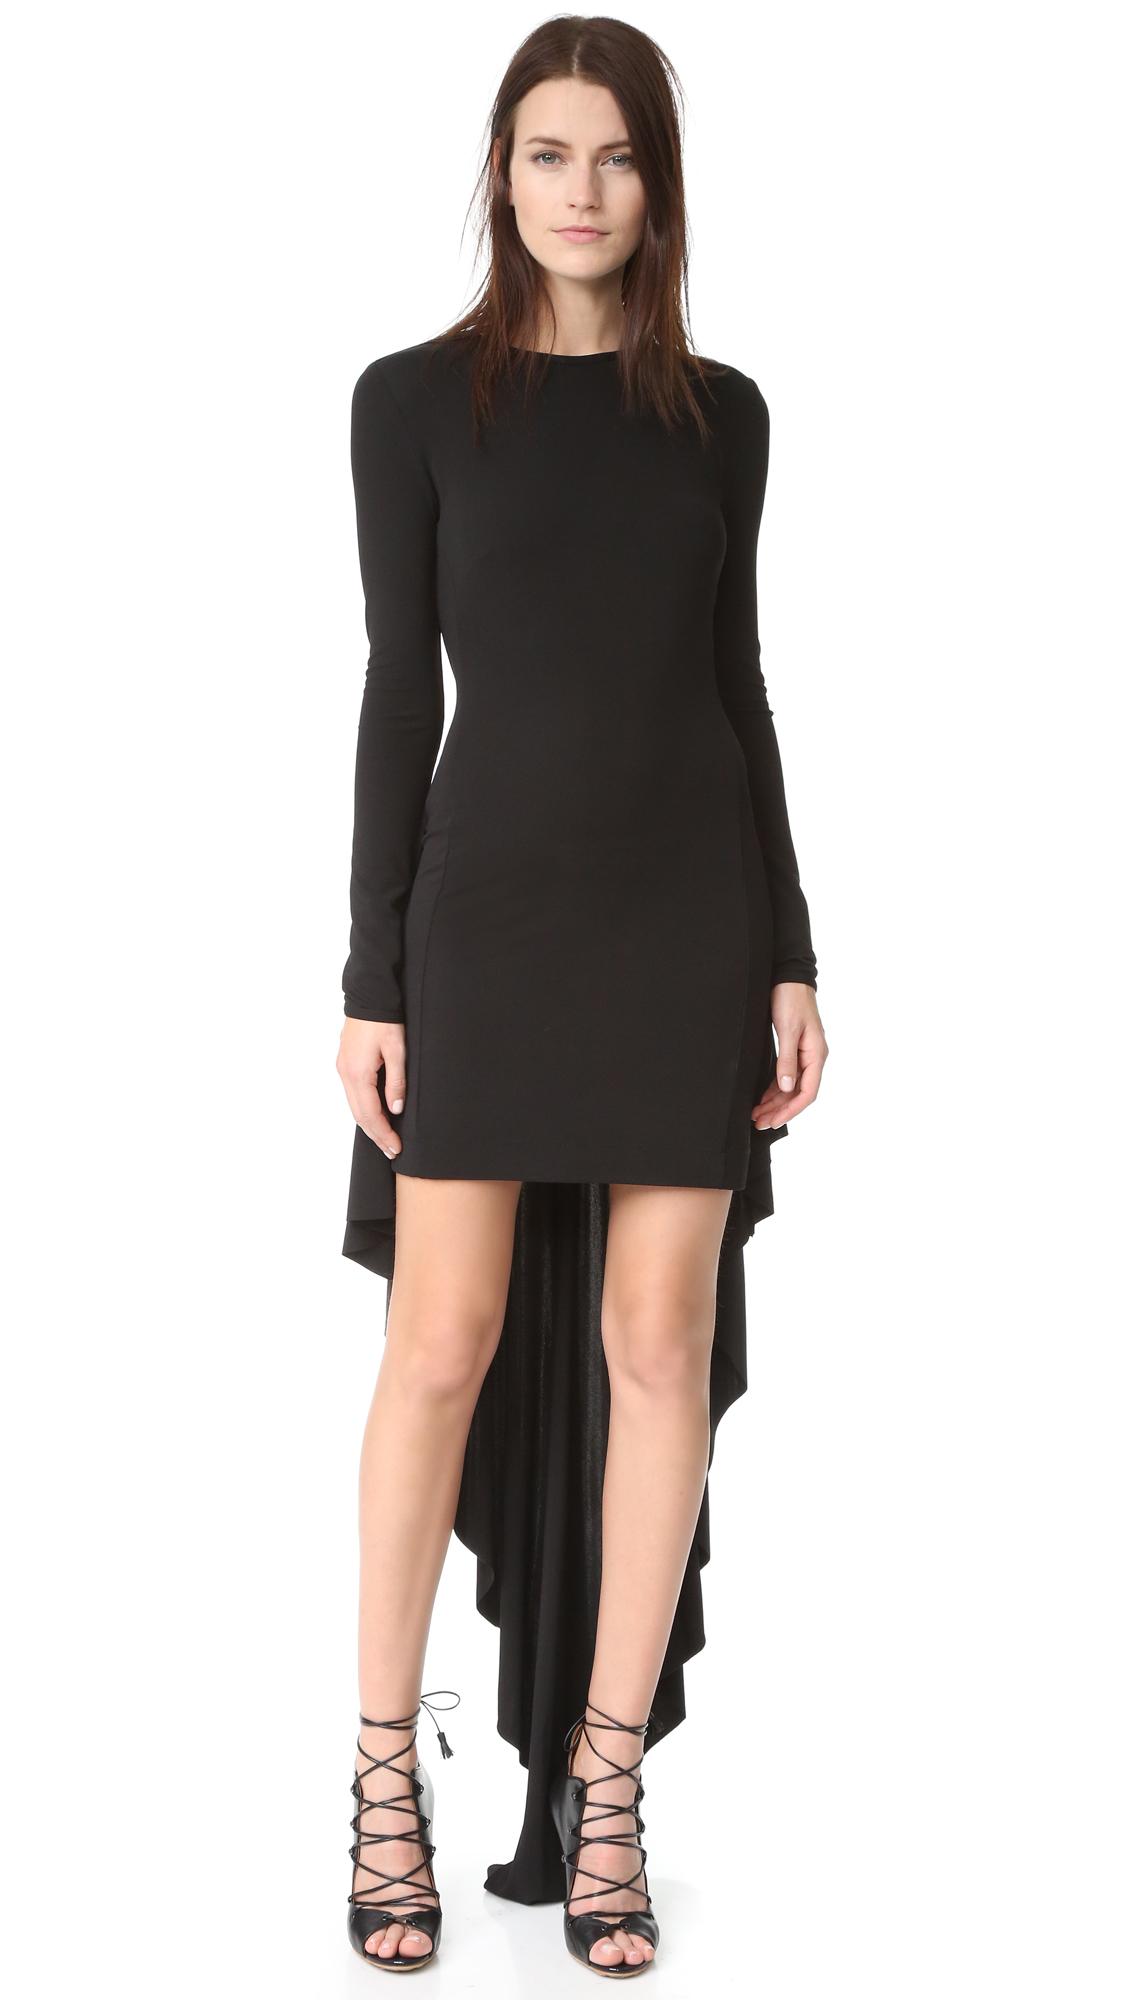 Antonio Berardi Long Sleeve Dress - Nero at Shopbop